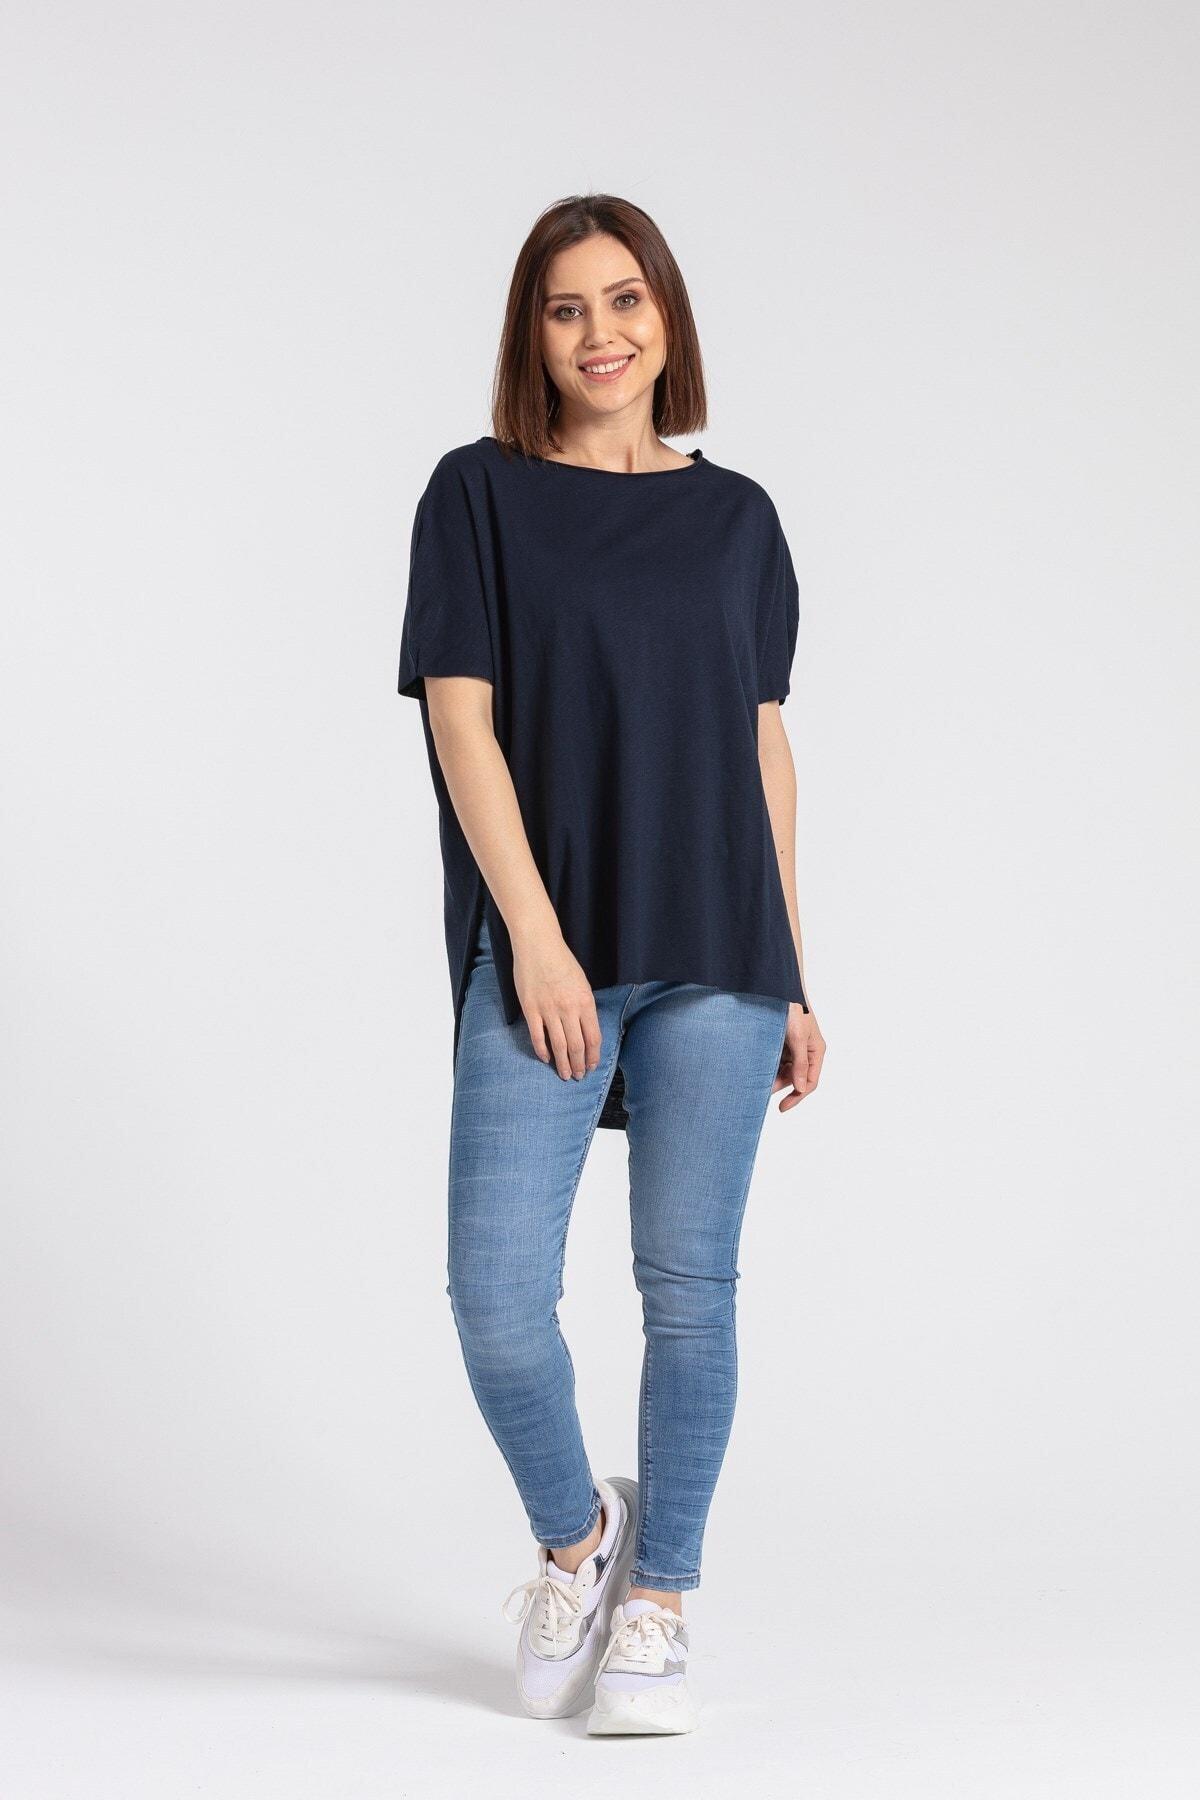 Jument Kadın Omuz Fermuarlı Salaş Pamuklu Basic Tshirt-lacivert 1